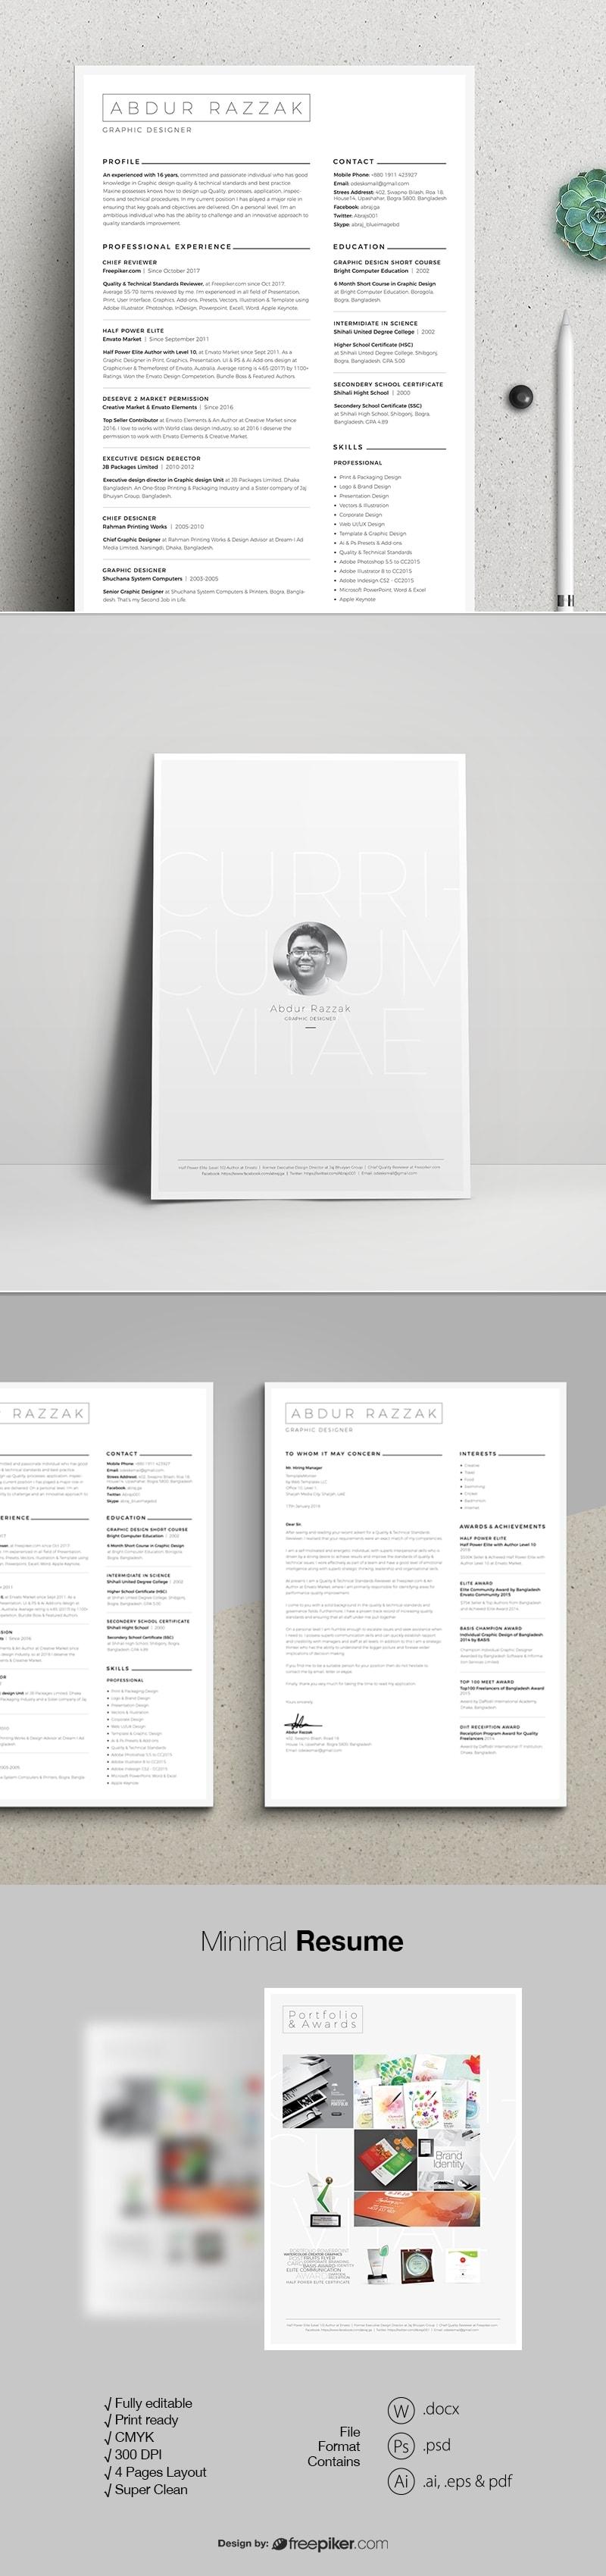 Freepiker | minimal resume with microsoft word & photoshop